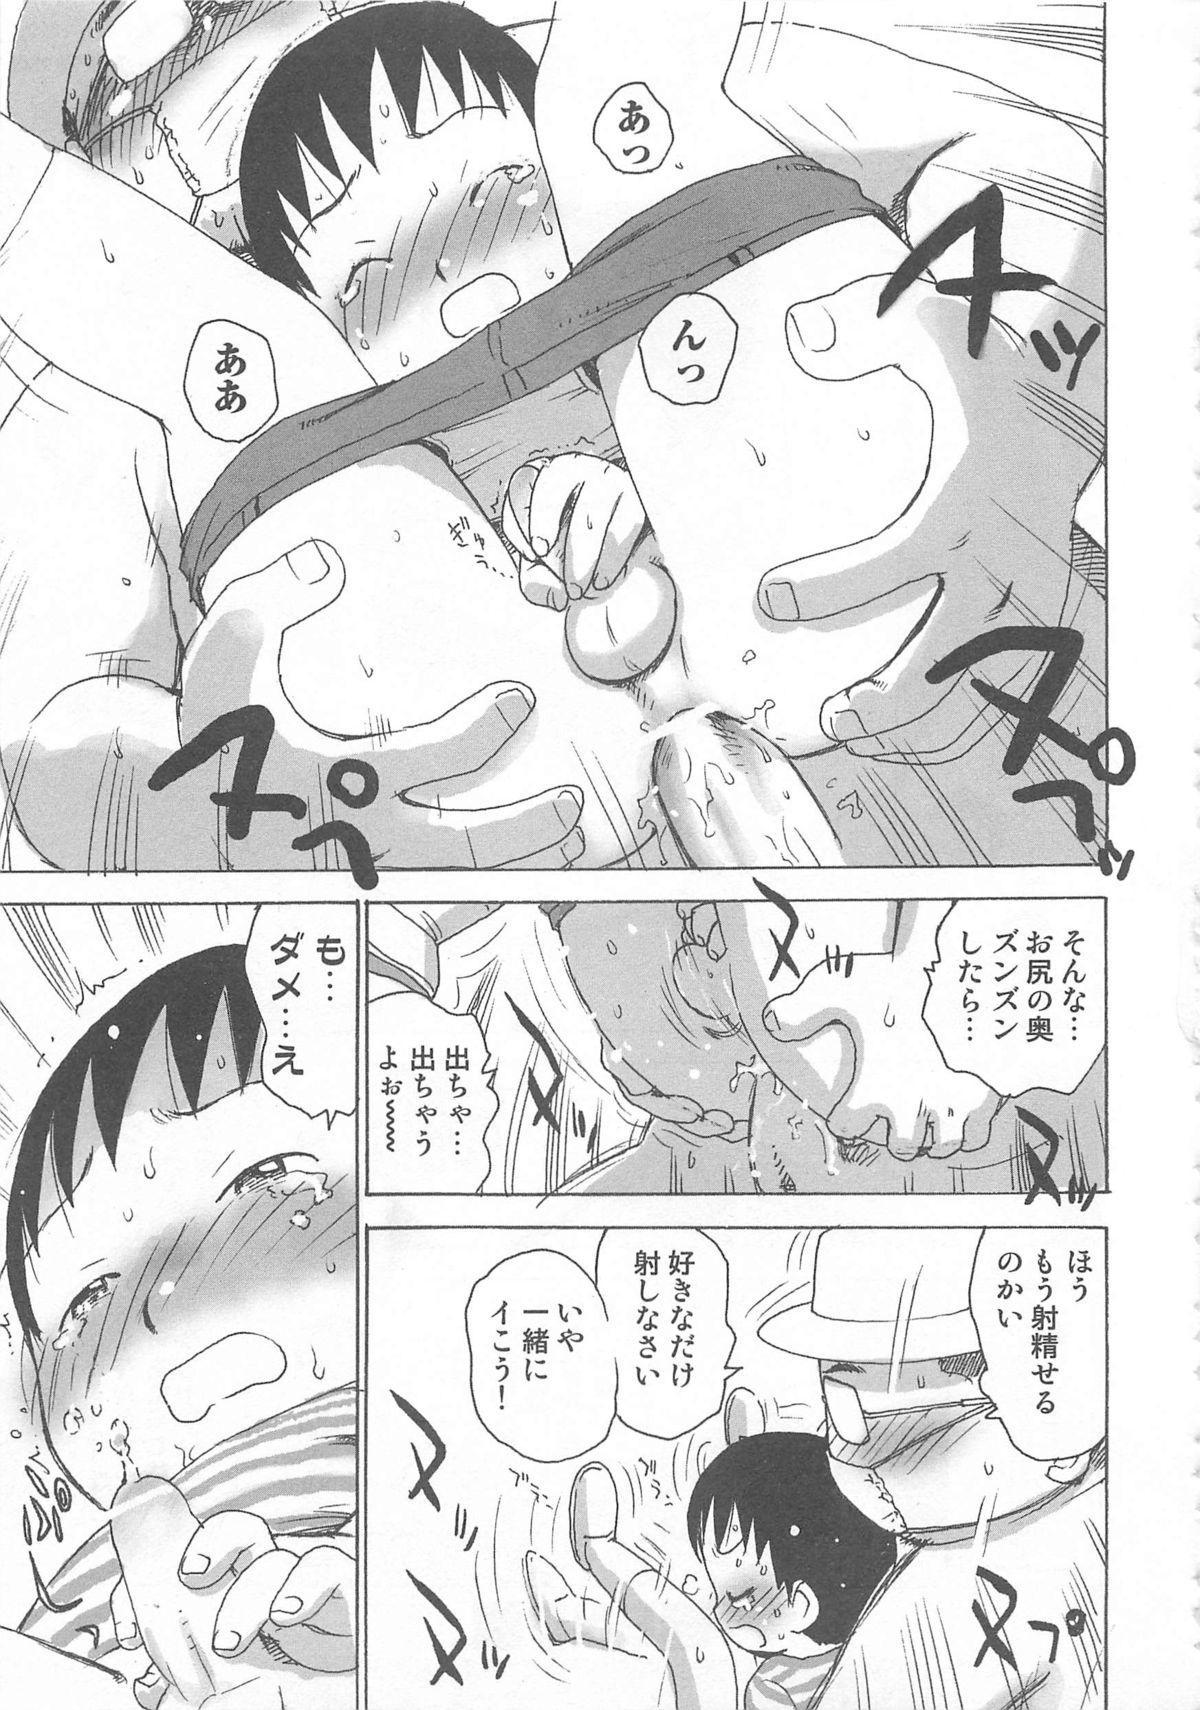 Otokonoko HEAVEN Vol. 02 Dokidoki Chikan Taiken 101